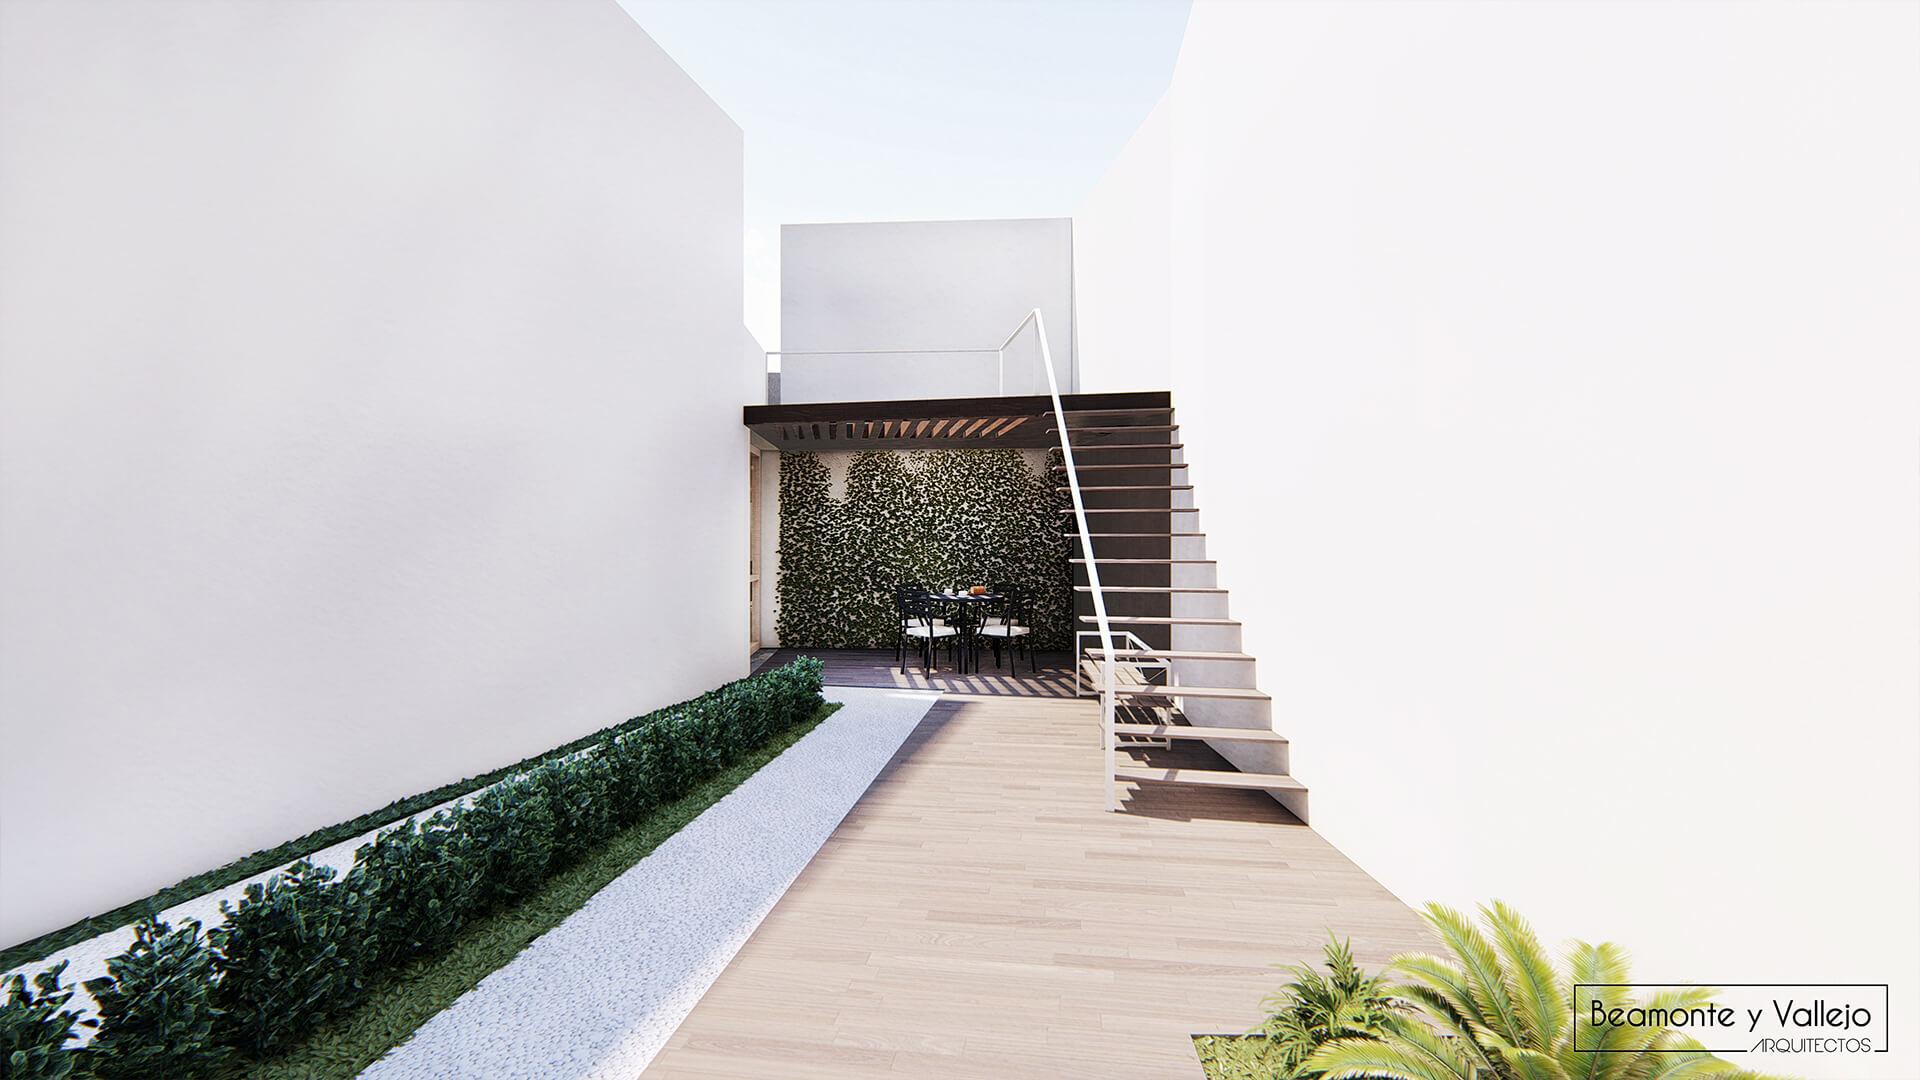 Beamonte y Vallejo Arquitectos - Passivhaus Leciñena 4